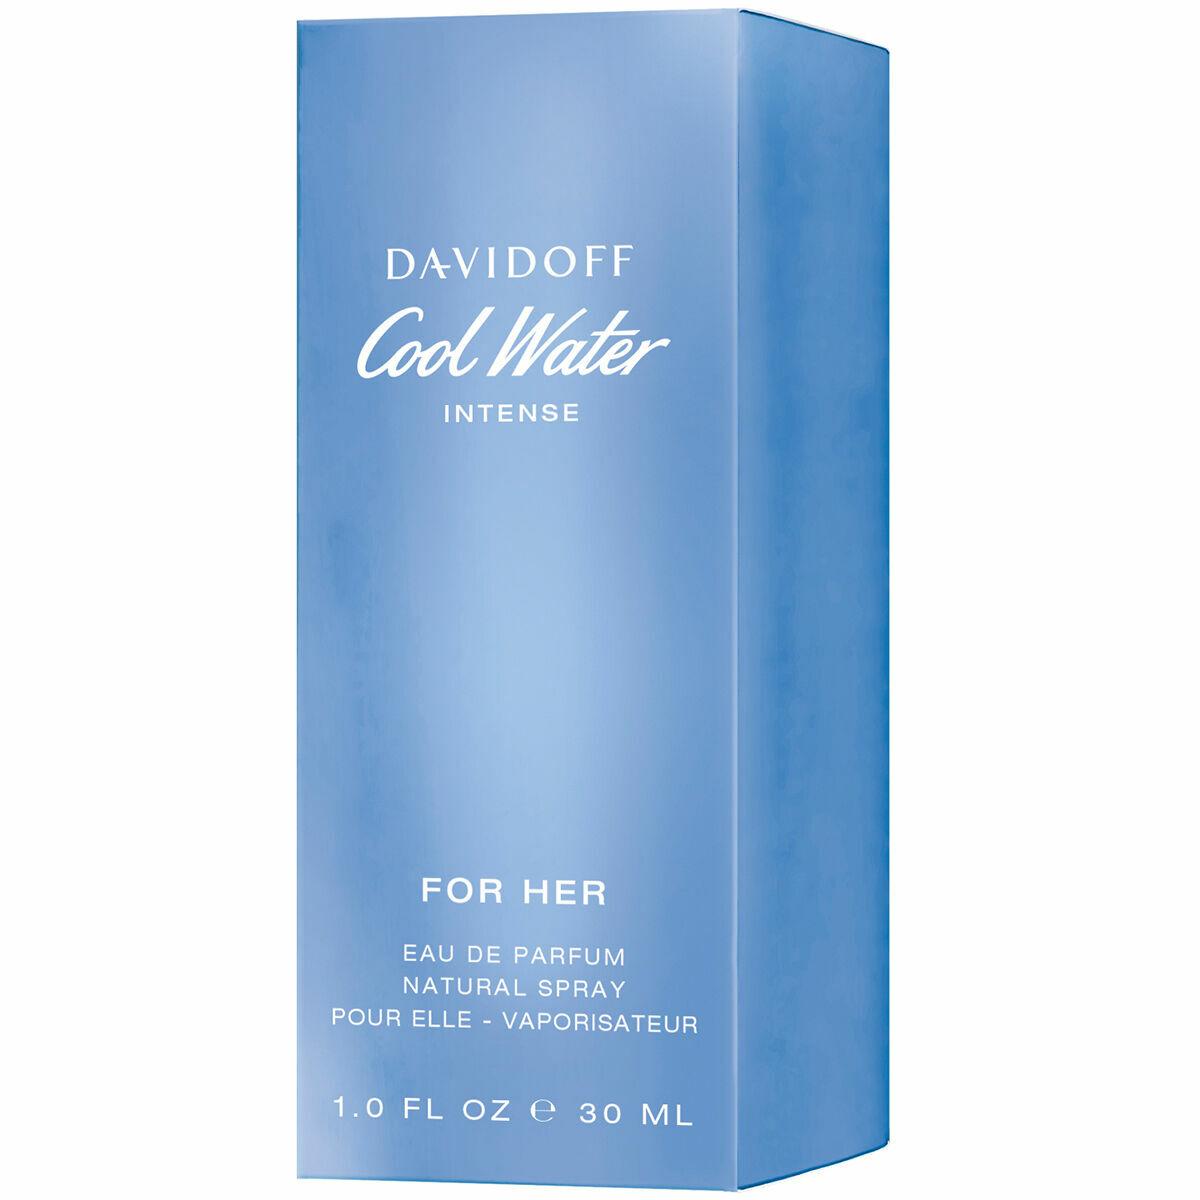 Bild 2 von Davidoff Cool Water Intense for Her, Eau de Parfum